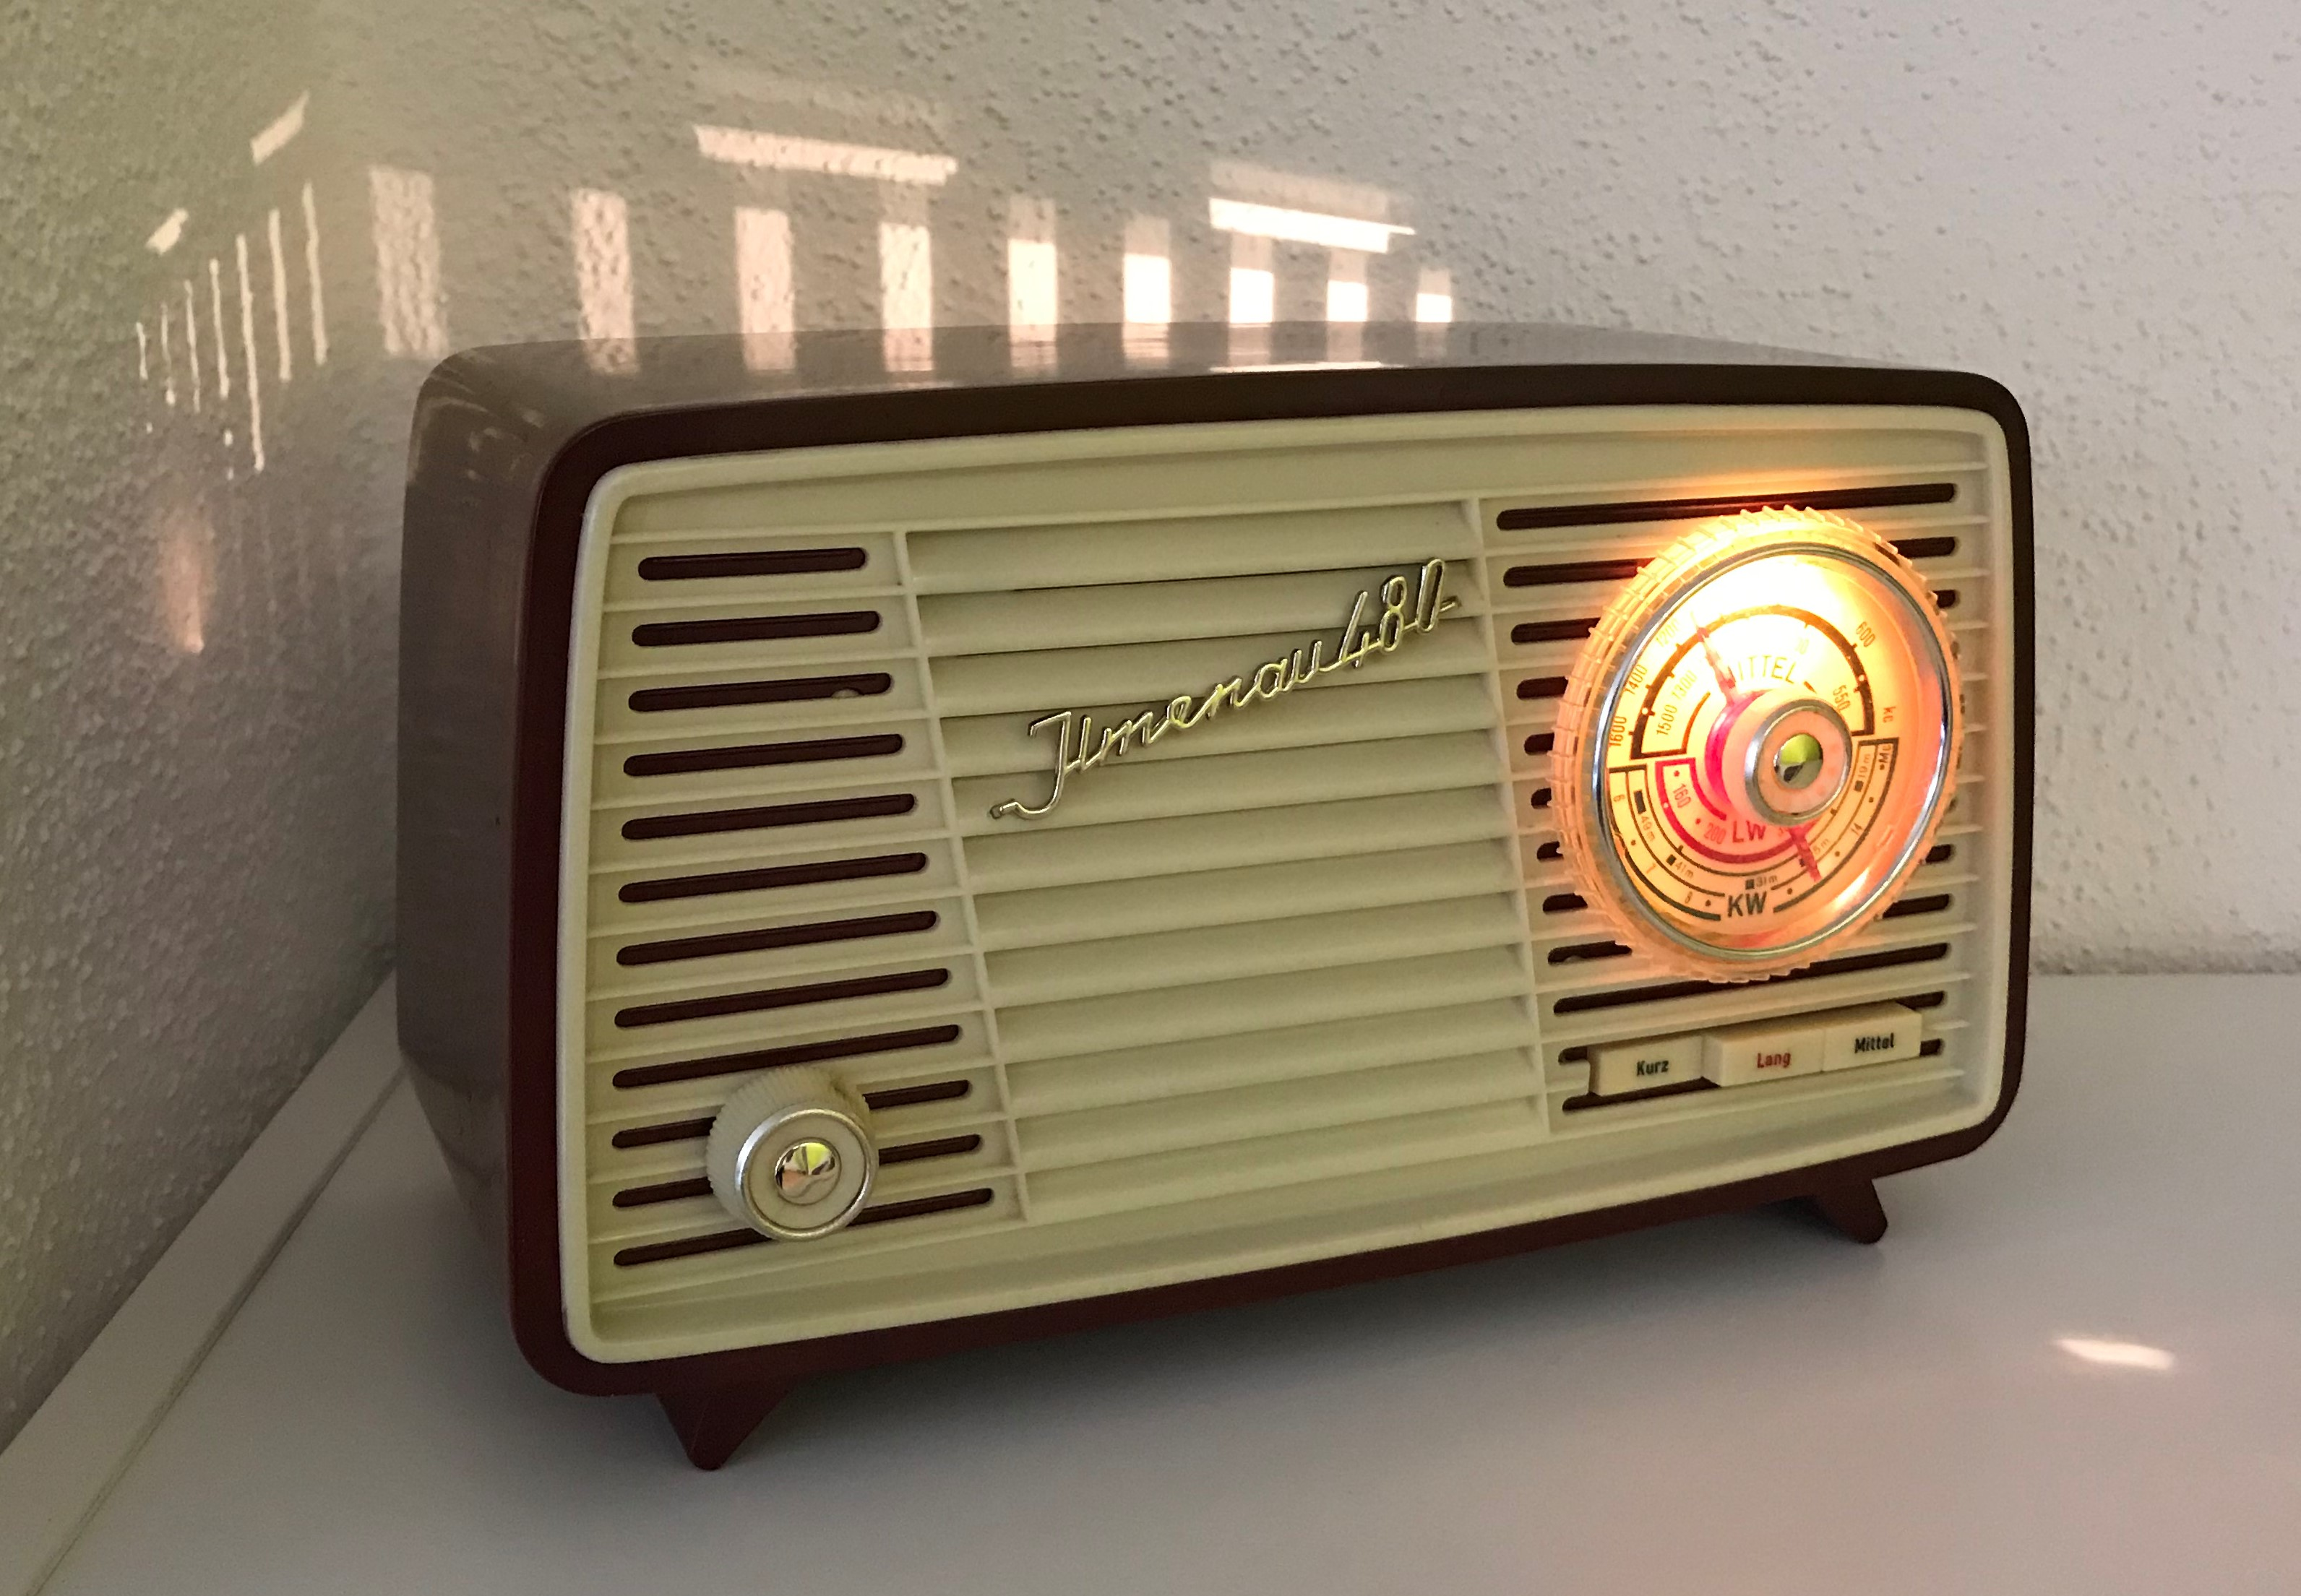 RFT Sternradio Ilmenau 480